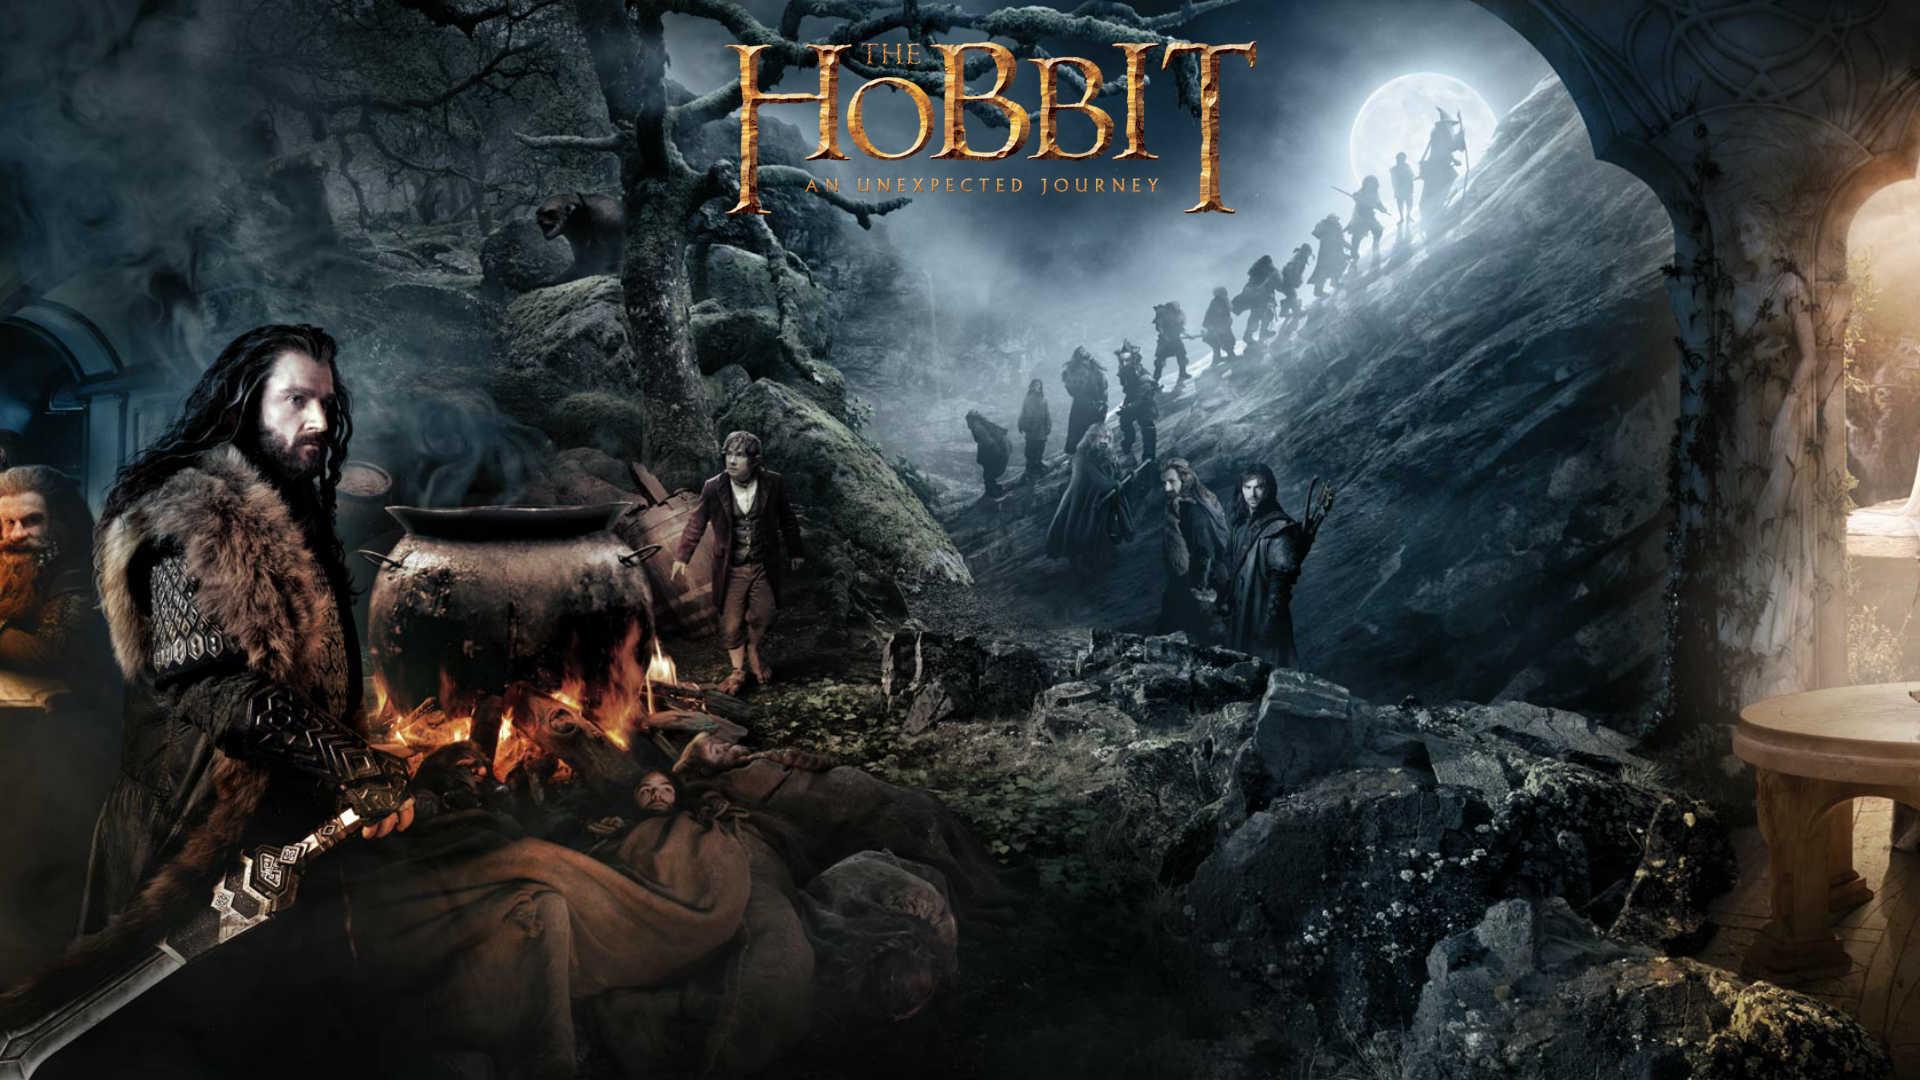 The Hobbit wallpaper   o hobbit wallpaper 33042231   fanpop 1920x1080